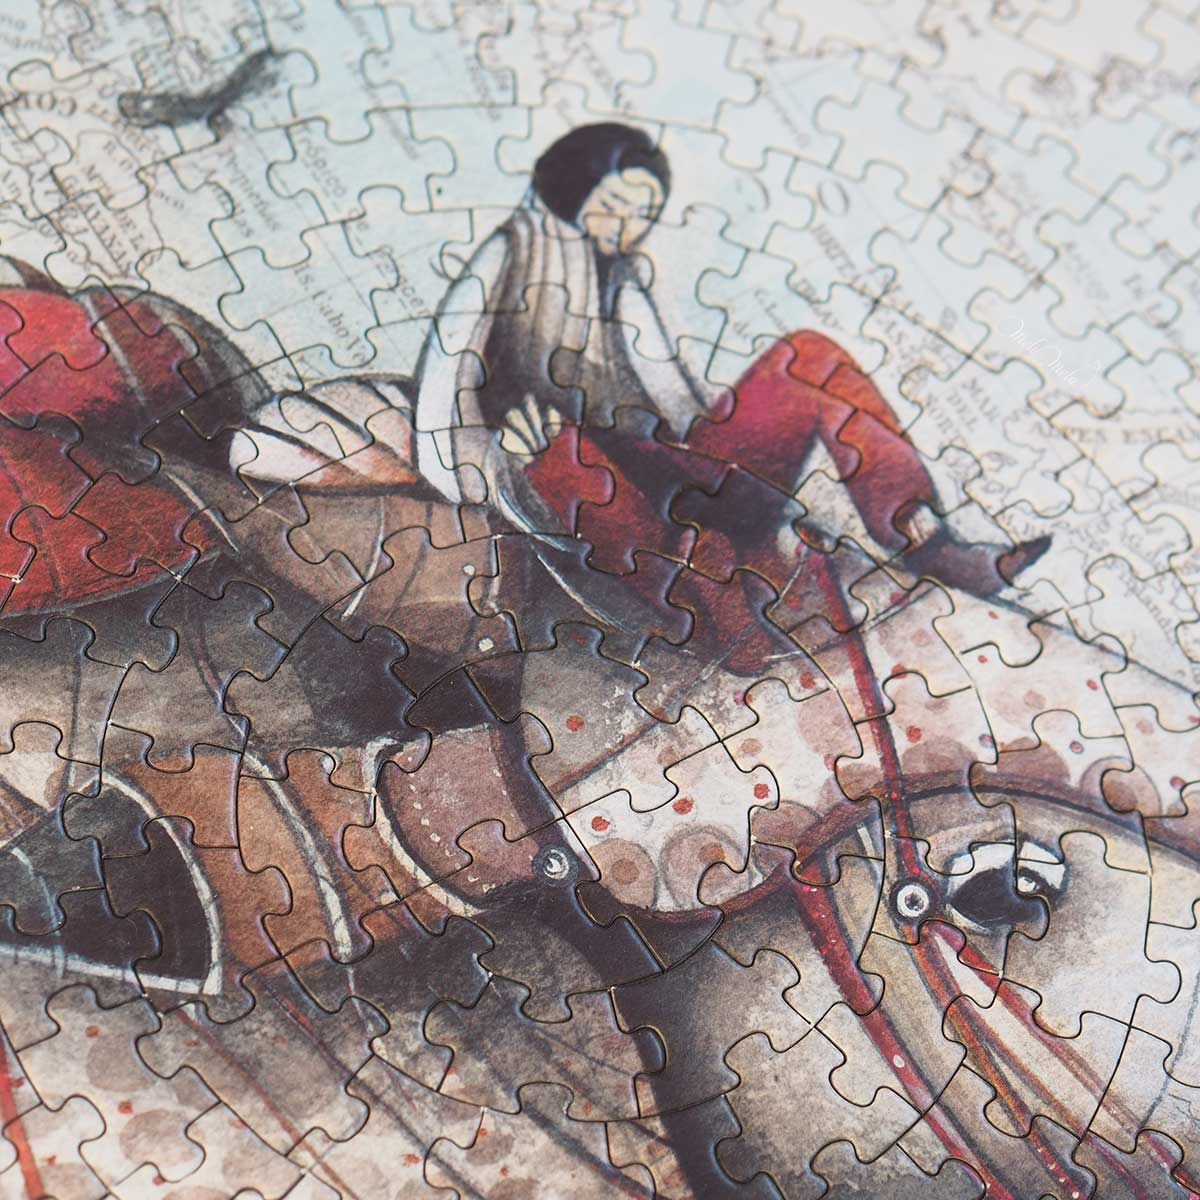 puzzle-circular-tatou-londji-delphine-labedan-laboutiquedemelimelo